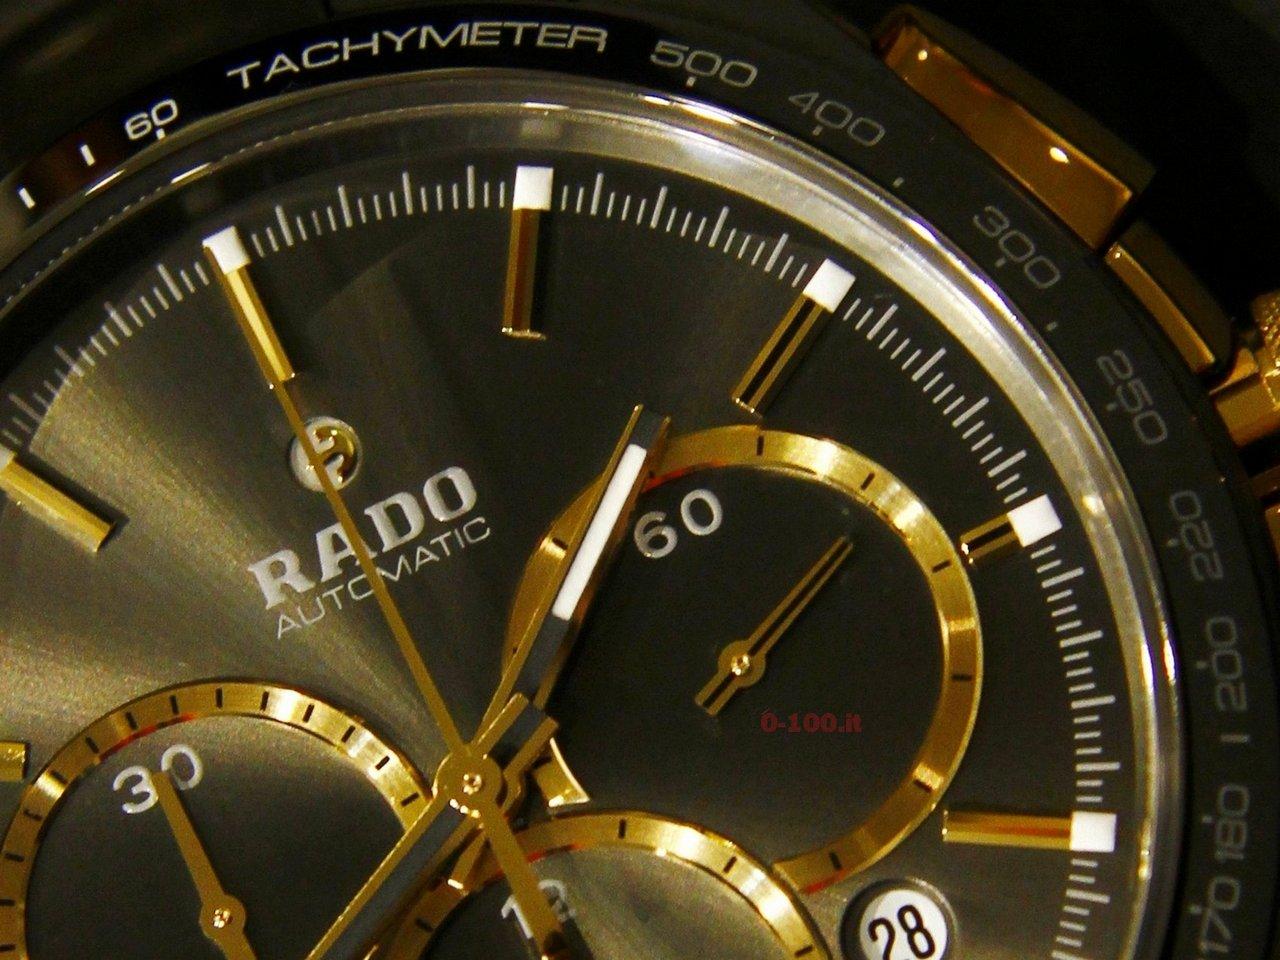 baselworld-2015_rado-hyperchrome-automatic-chronograph--10